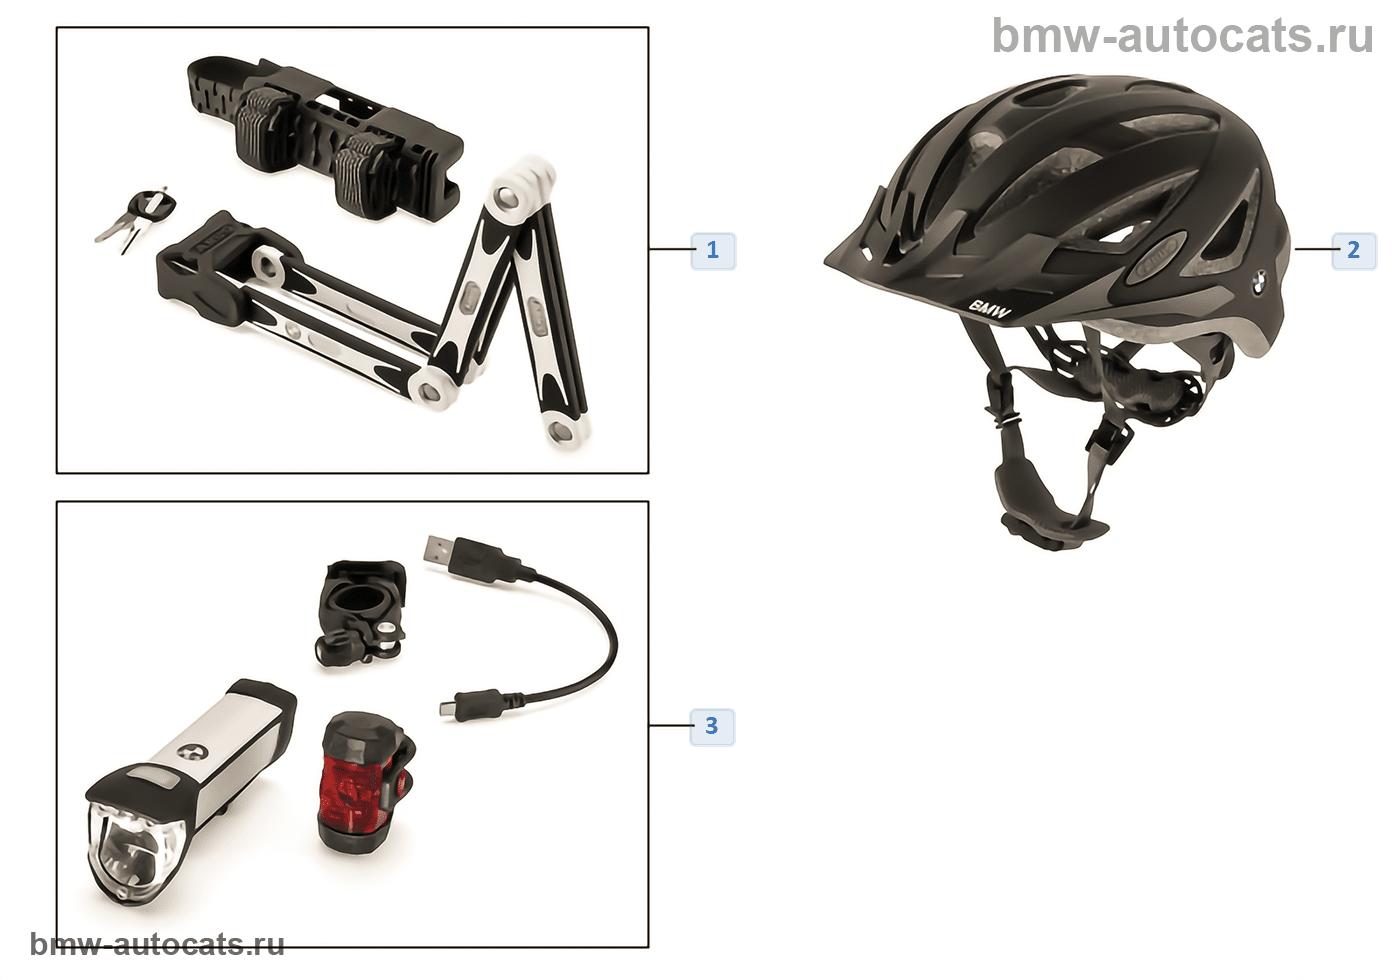 BMW Bikes & Equipment аксессуары 16-18